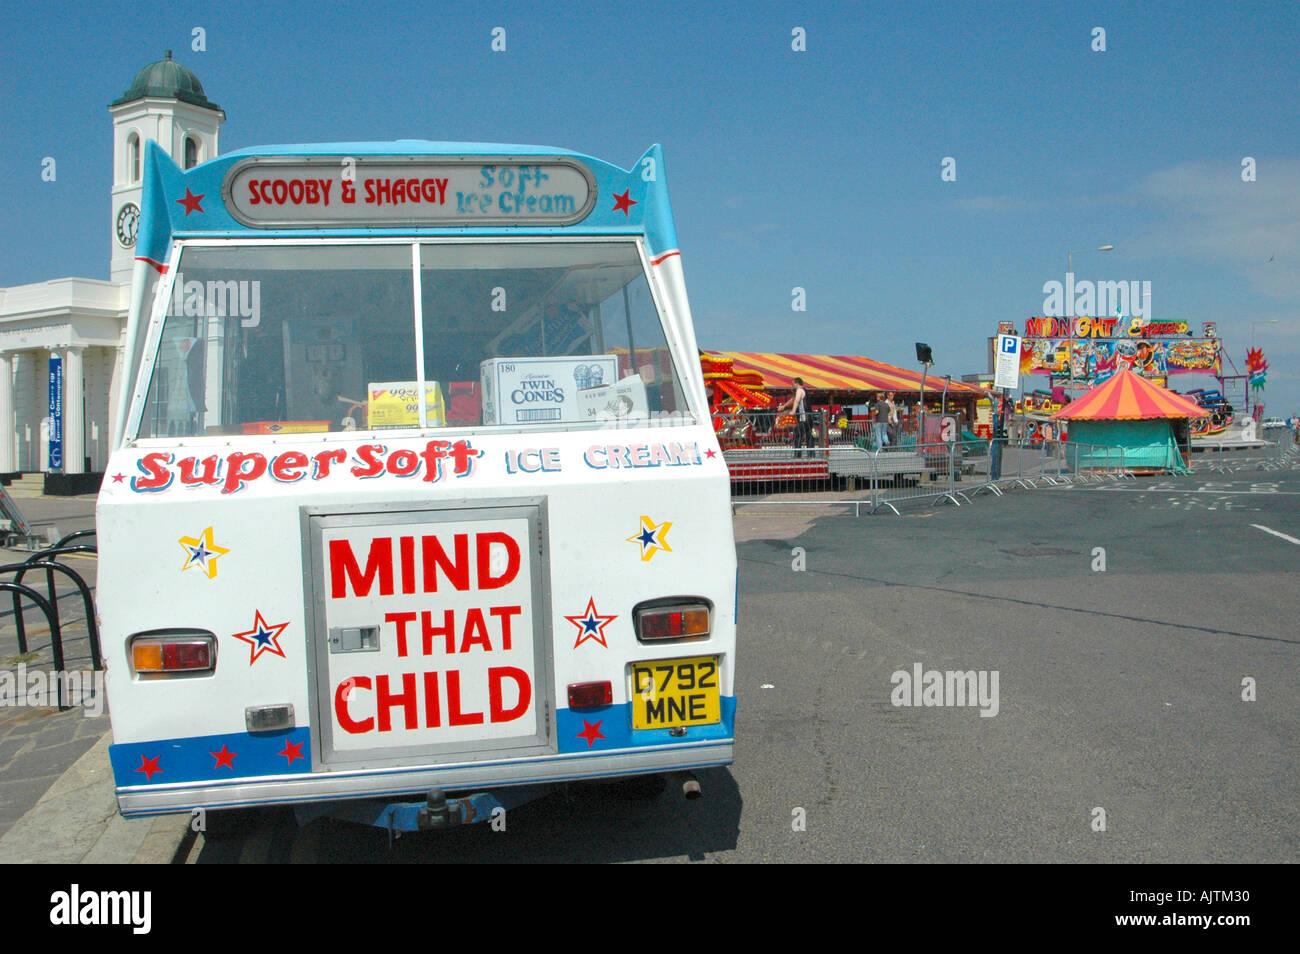 ice-cream-van-with-funfair-in-the-backgr